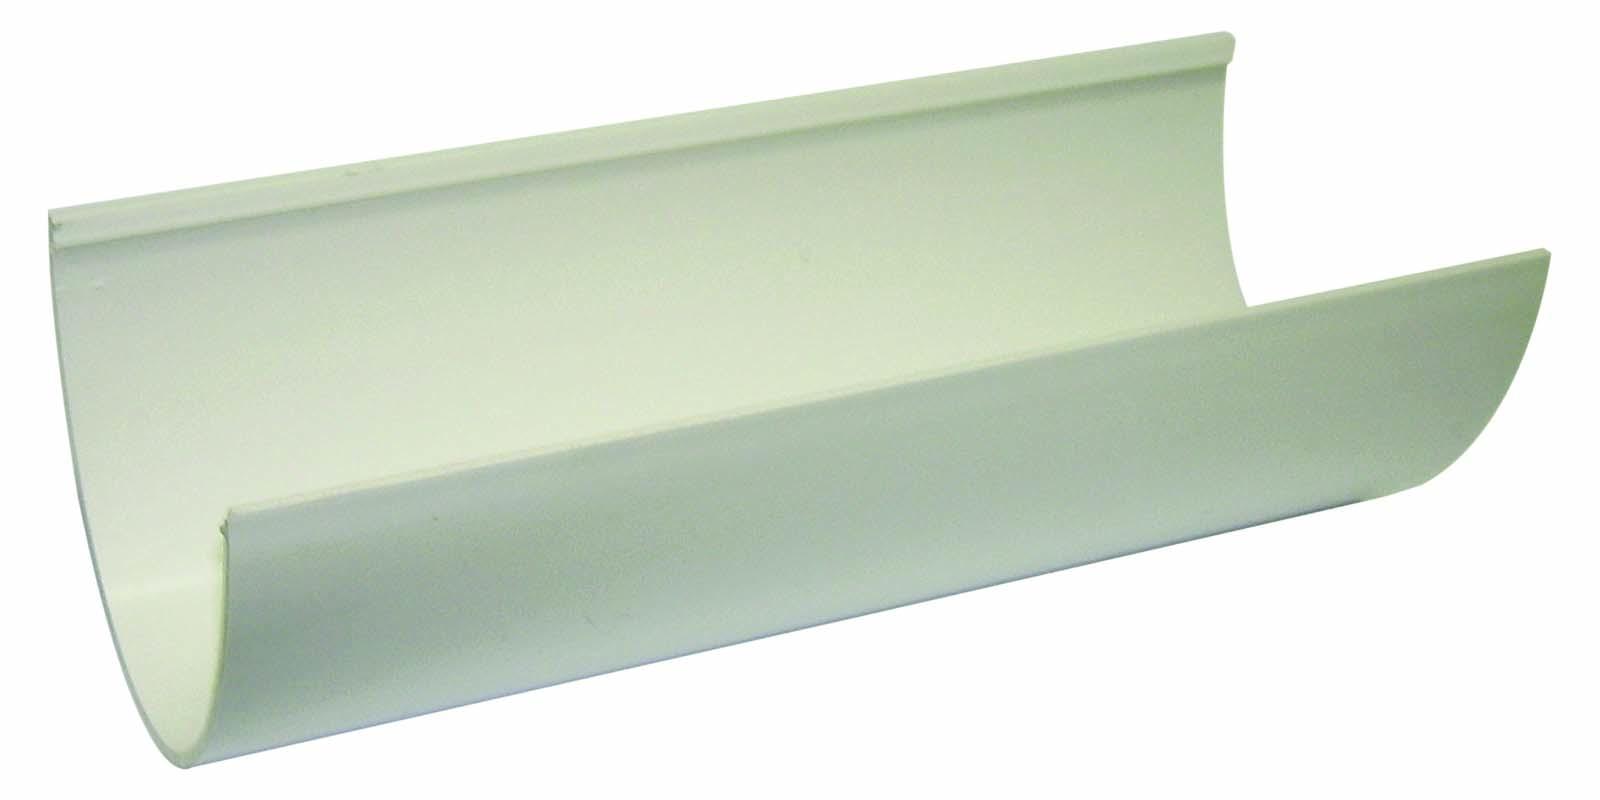 Floplast RGH4WH 115mm Hi-Cap (Deepflow) Gutter 4 Metre - White